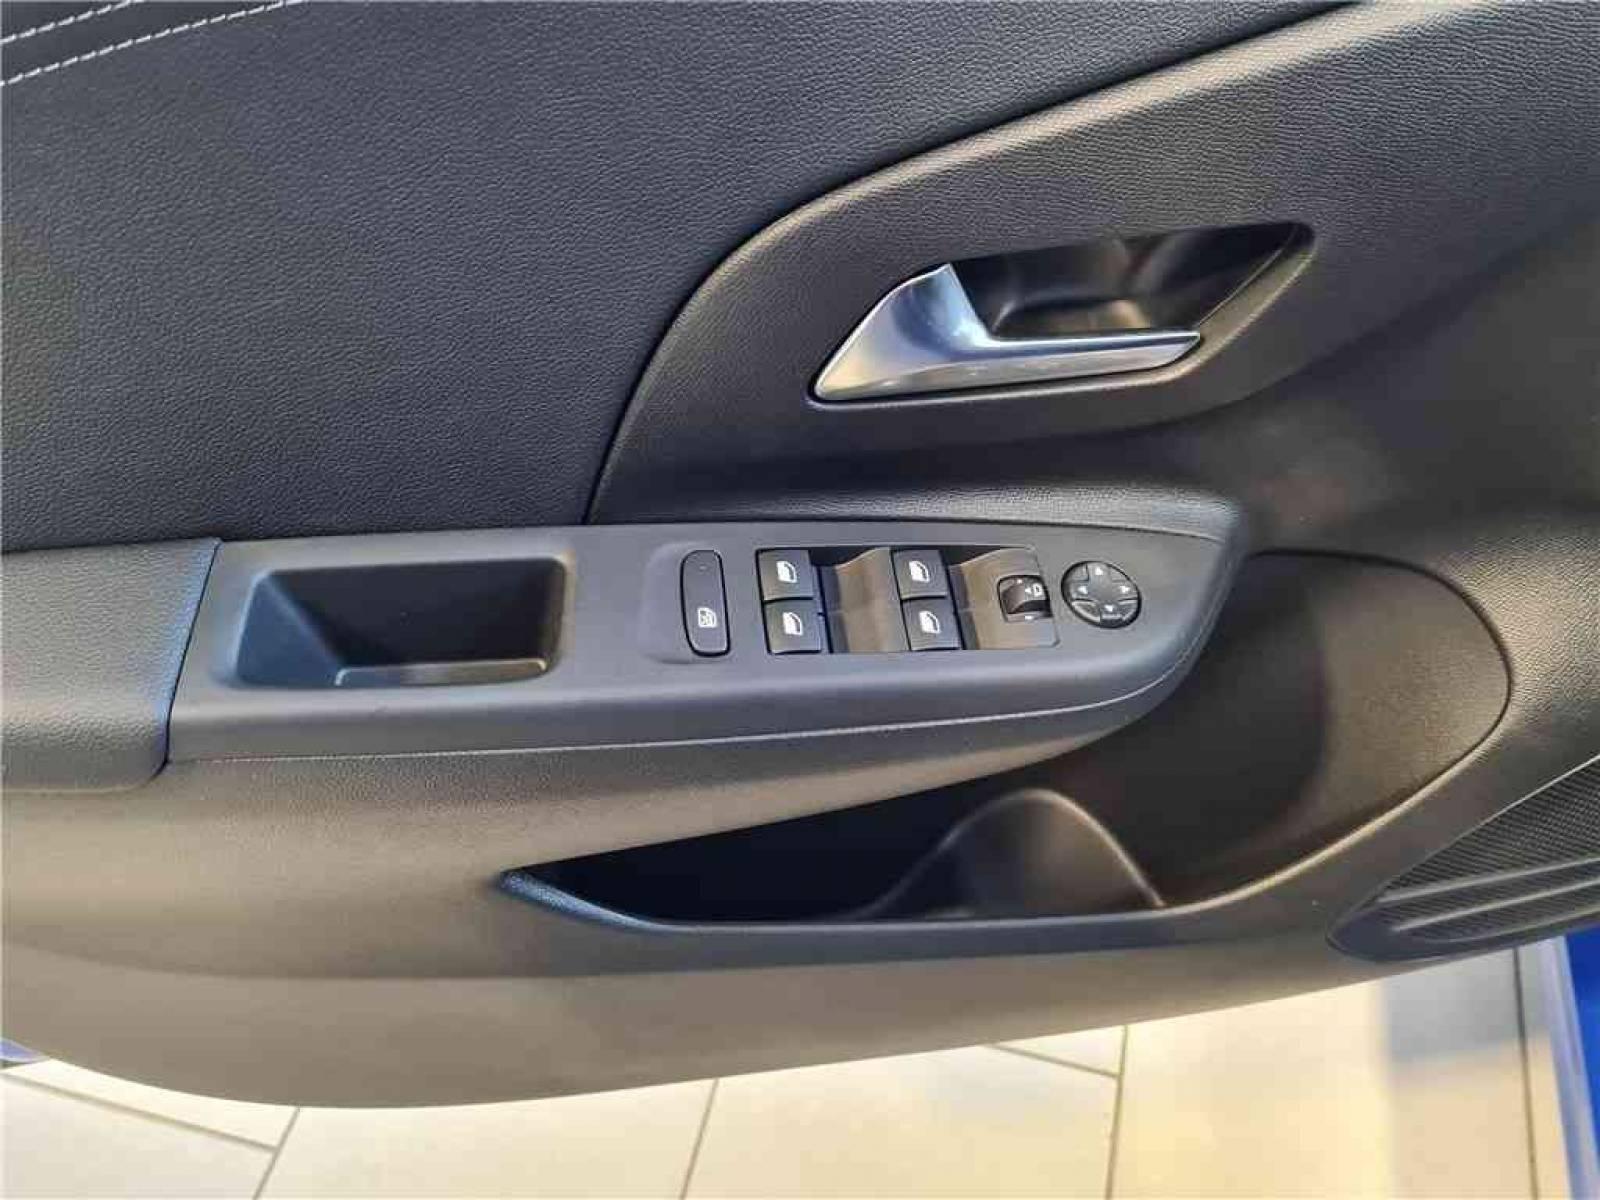 OPEL Corsa 1.2 Turbo 100 ch BVM6 - véhicule d'occasion - Groupe Guillet - Opel Magicauto - Chalon-sur-Saône - 71380 - Saint-Marcel - 20